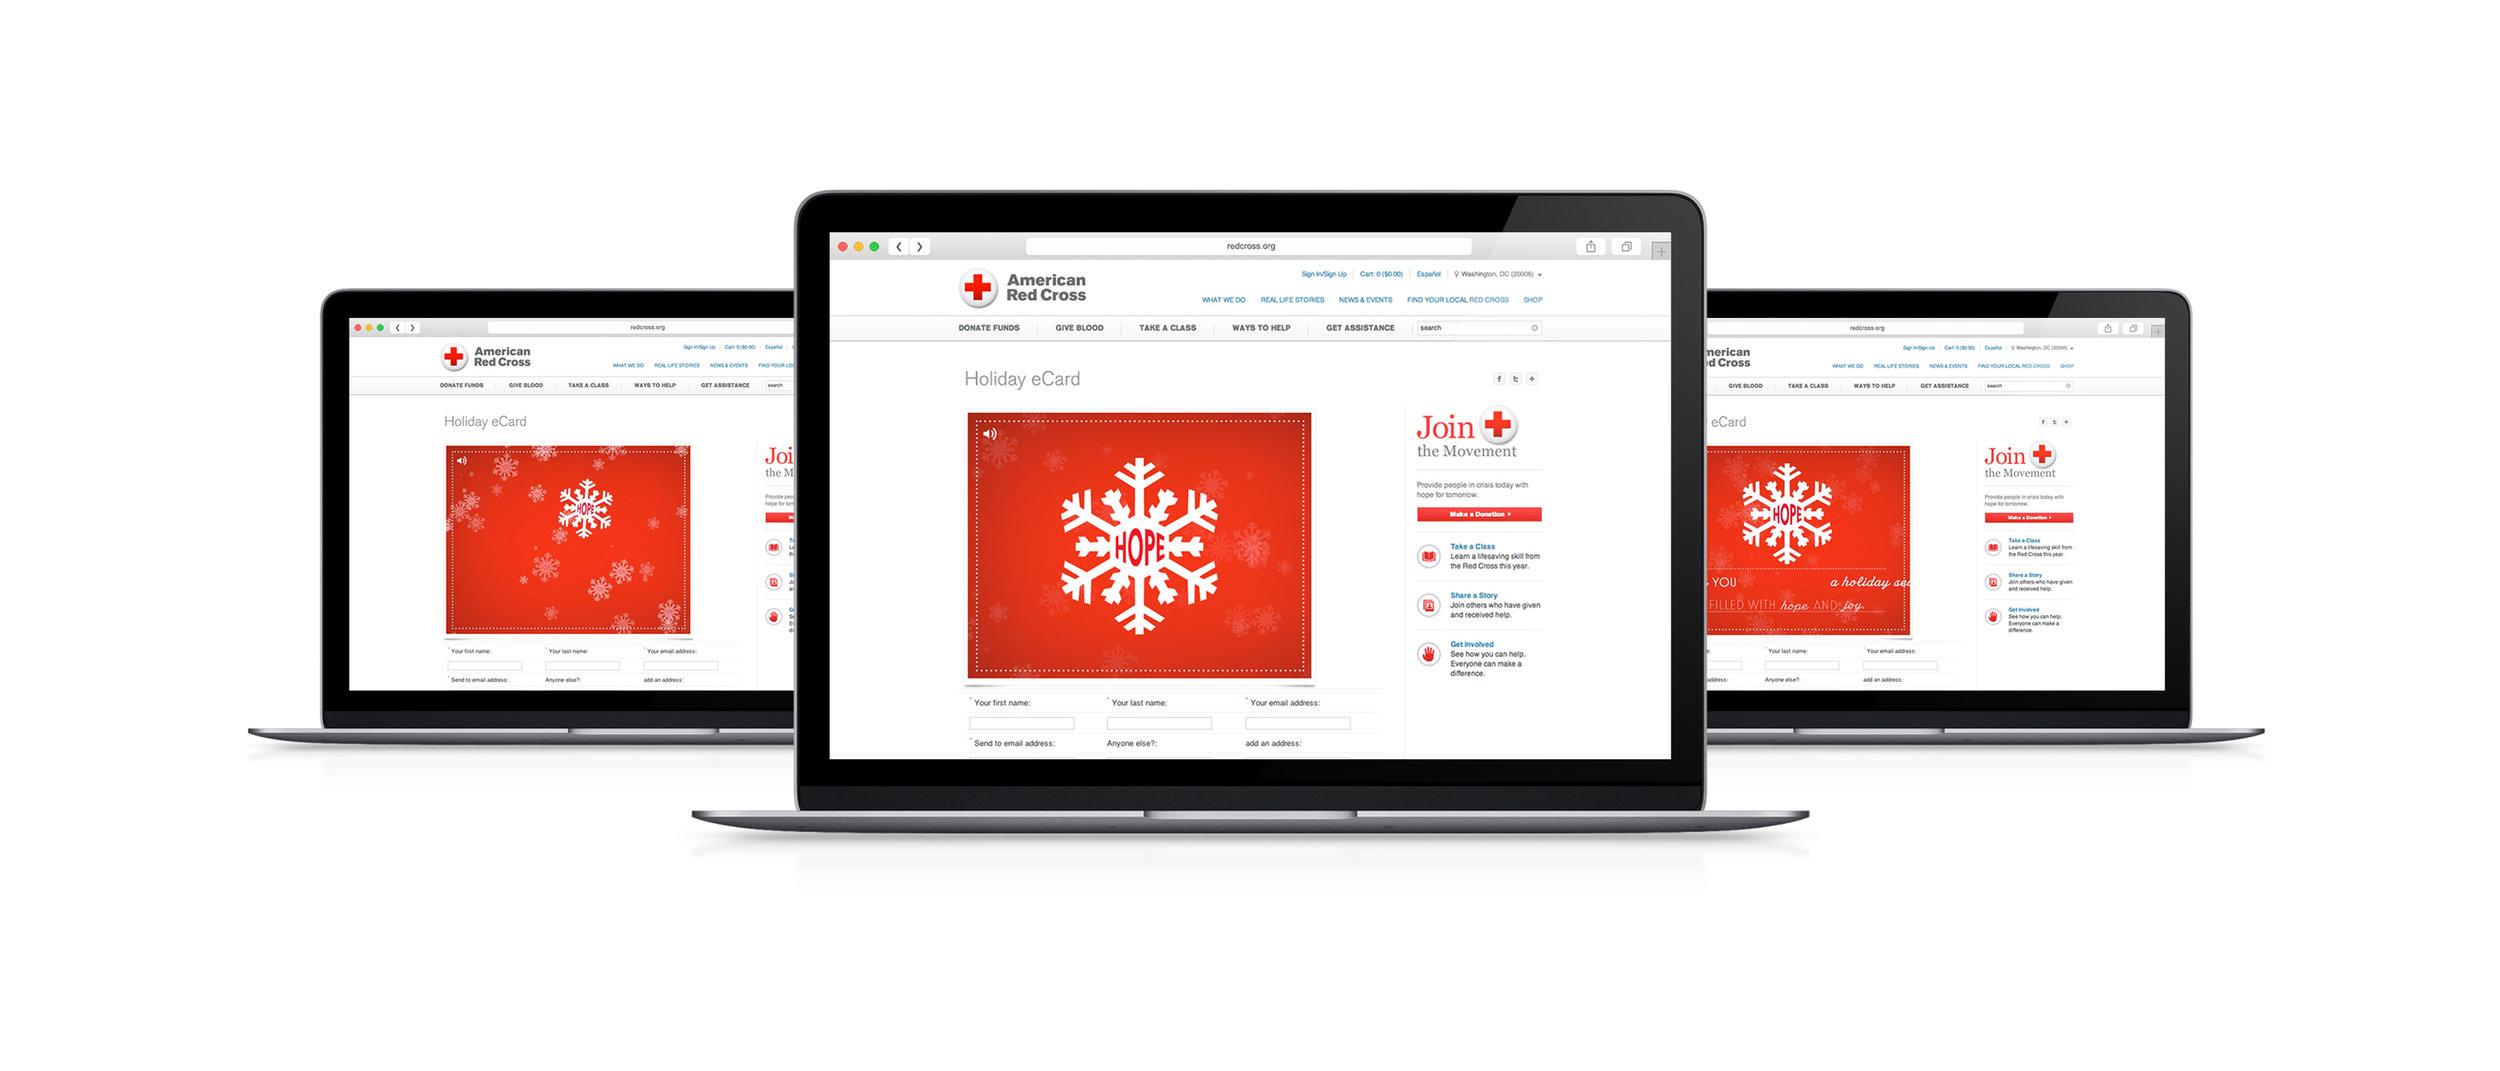 American Red Cross Animated Holiday eCard — Sharyn Lange